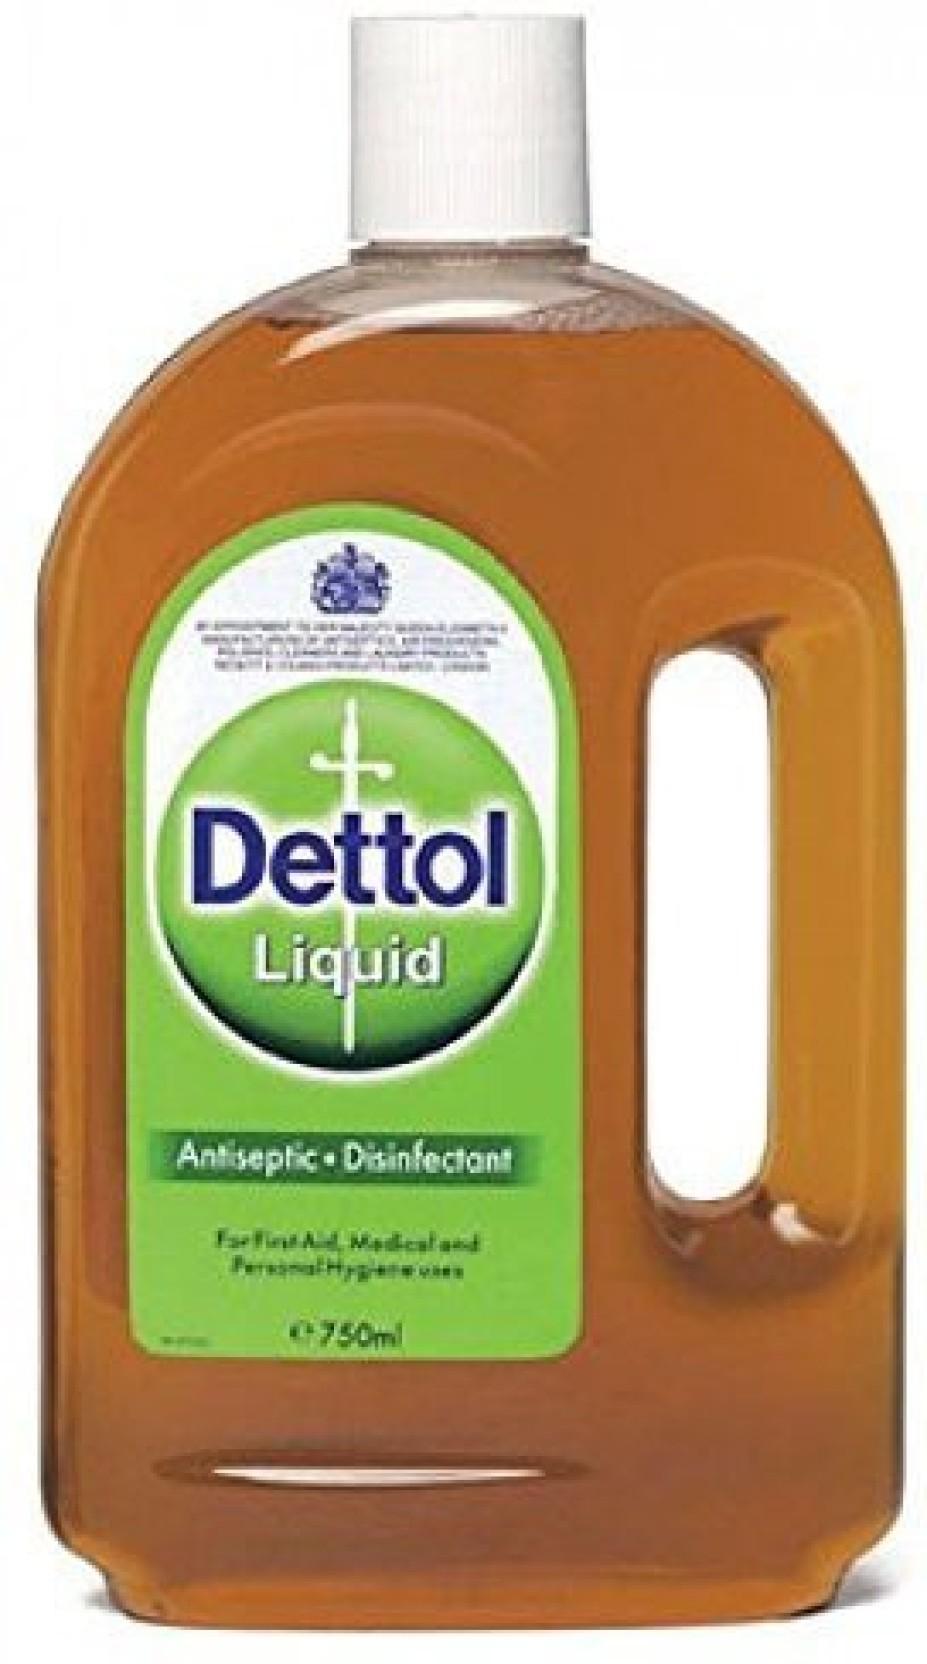 Dettol Antiseptic Liquid 750ml England Price In India Buy 100 Ml Share